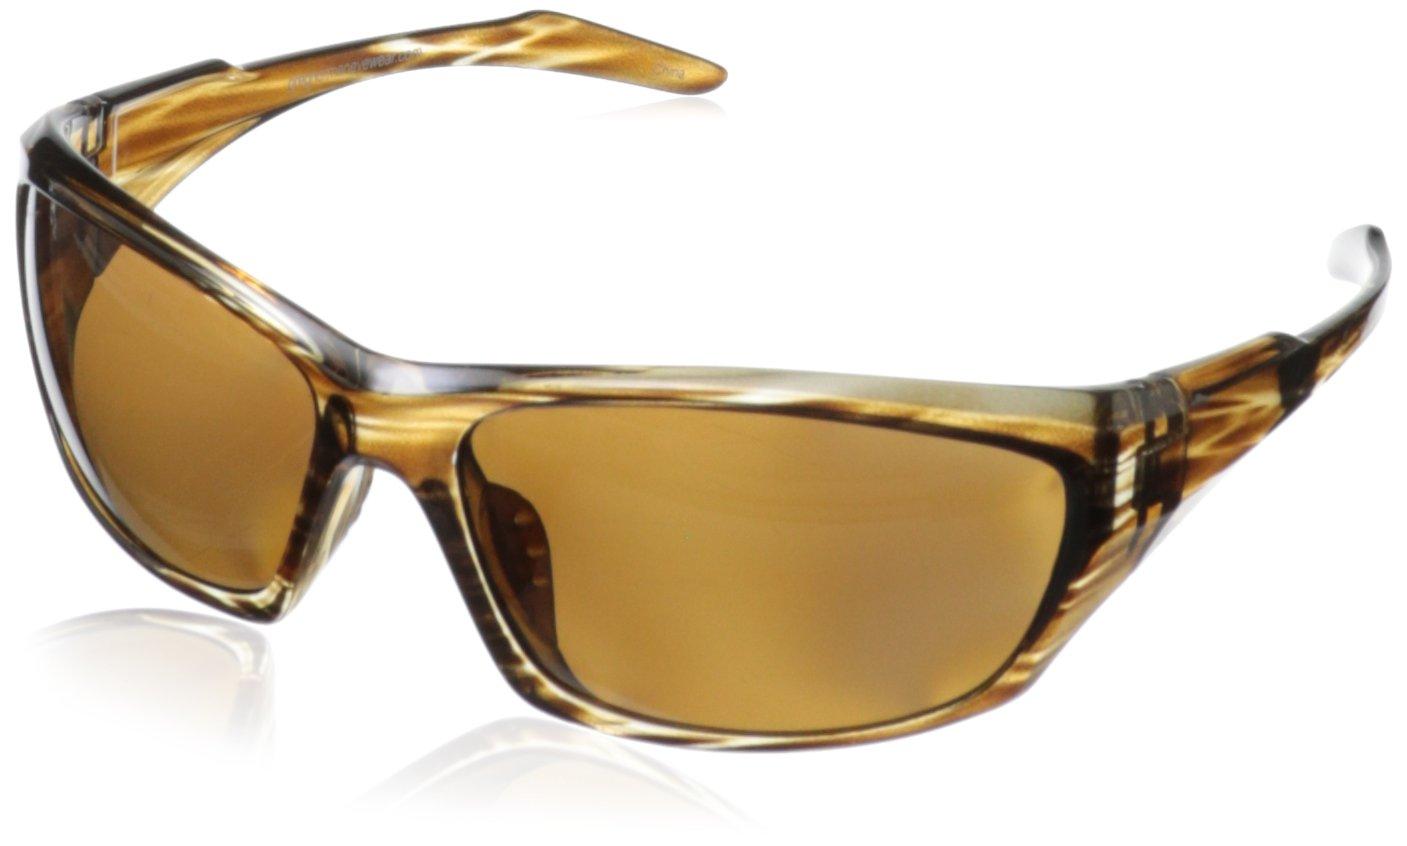 Greg Norman G4608 Polarized Sport Soft Rectangle Melanin Sunglasses,Brown Stripe, 68 mm